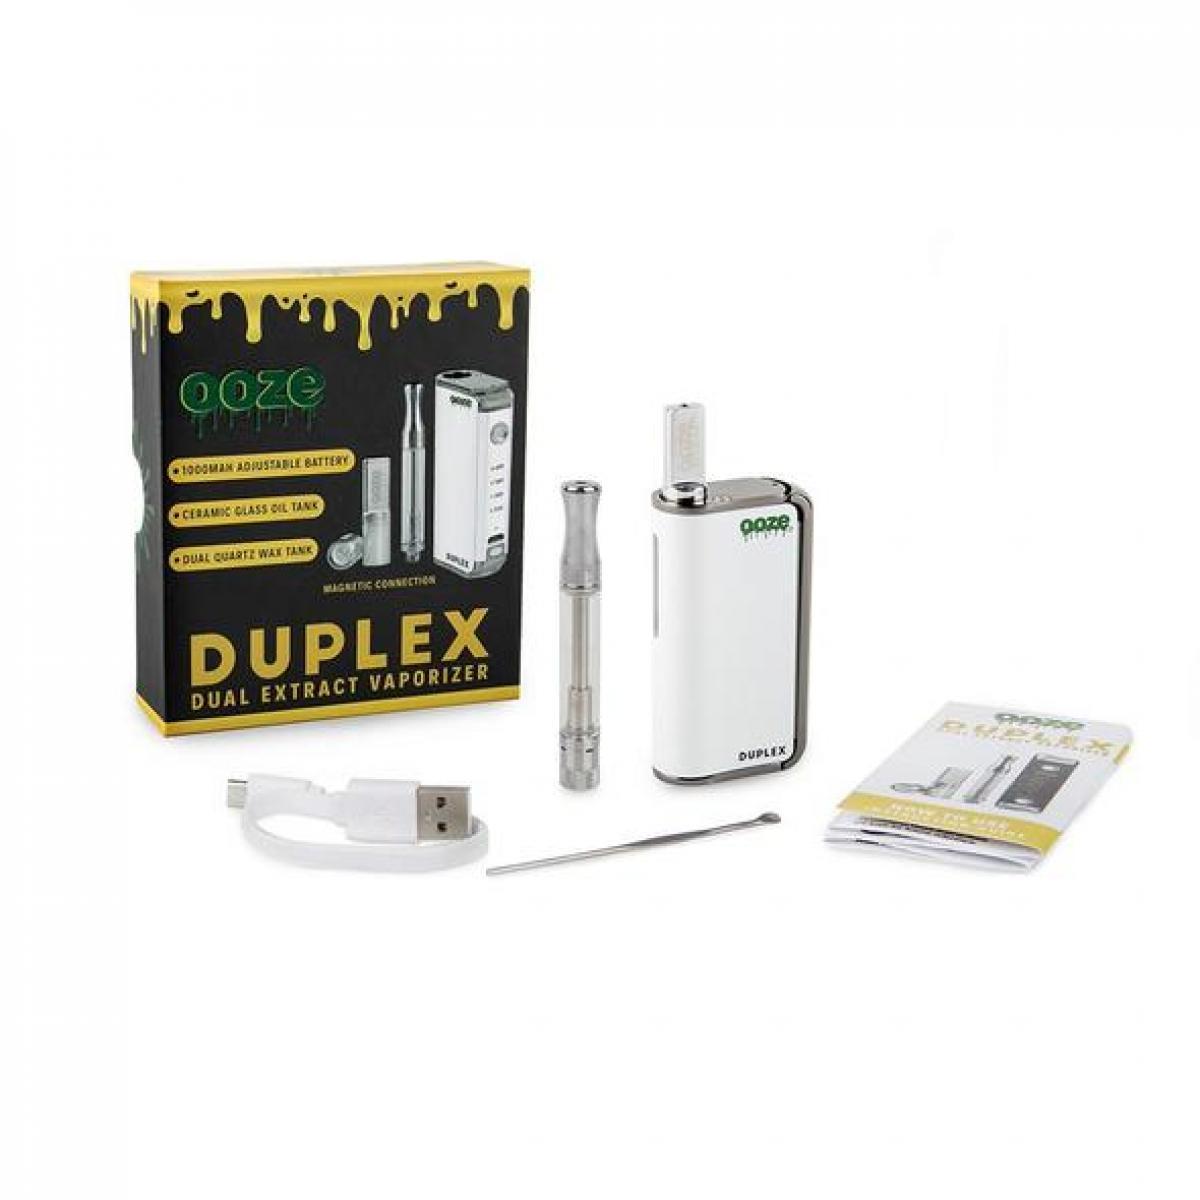 Ooze Duplex